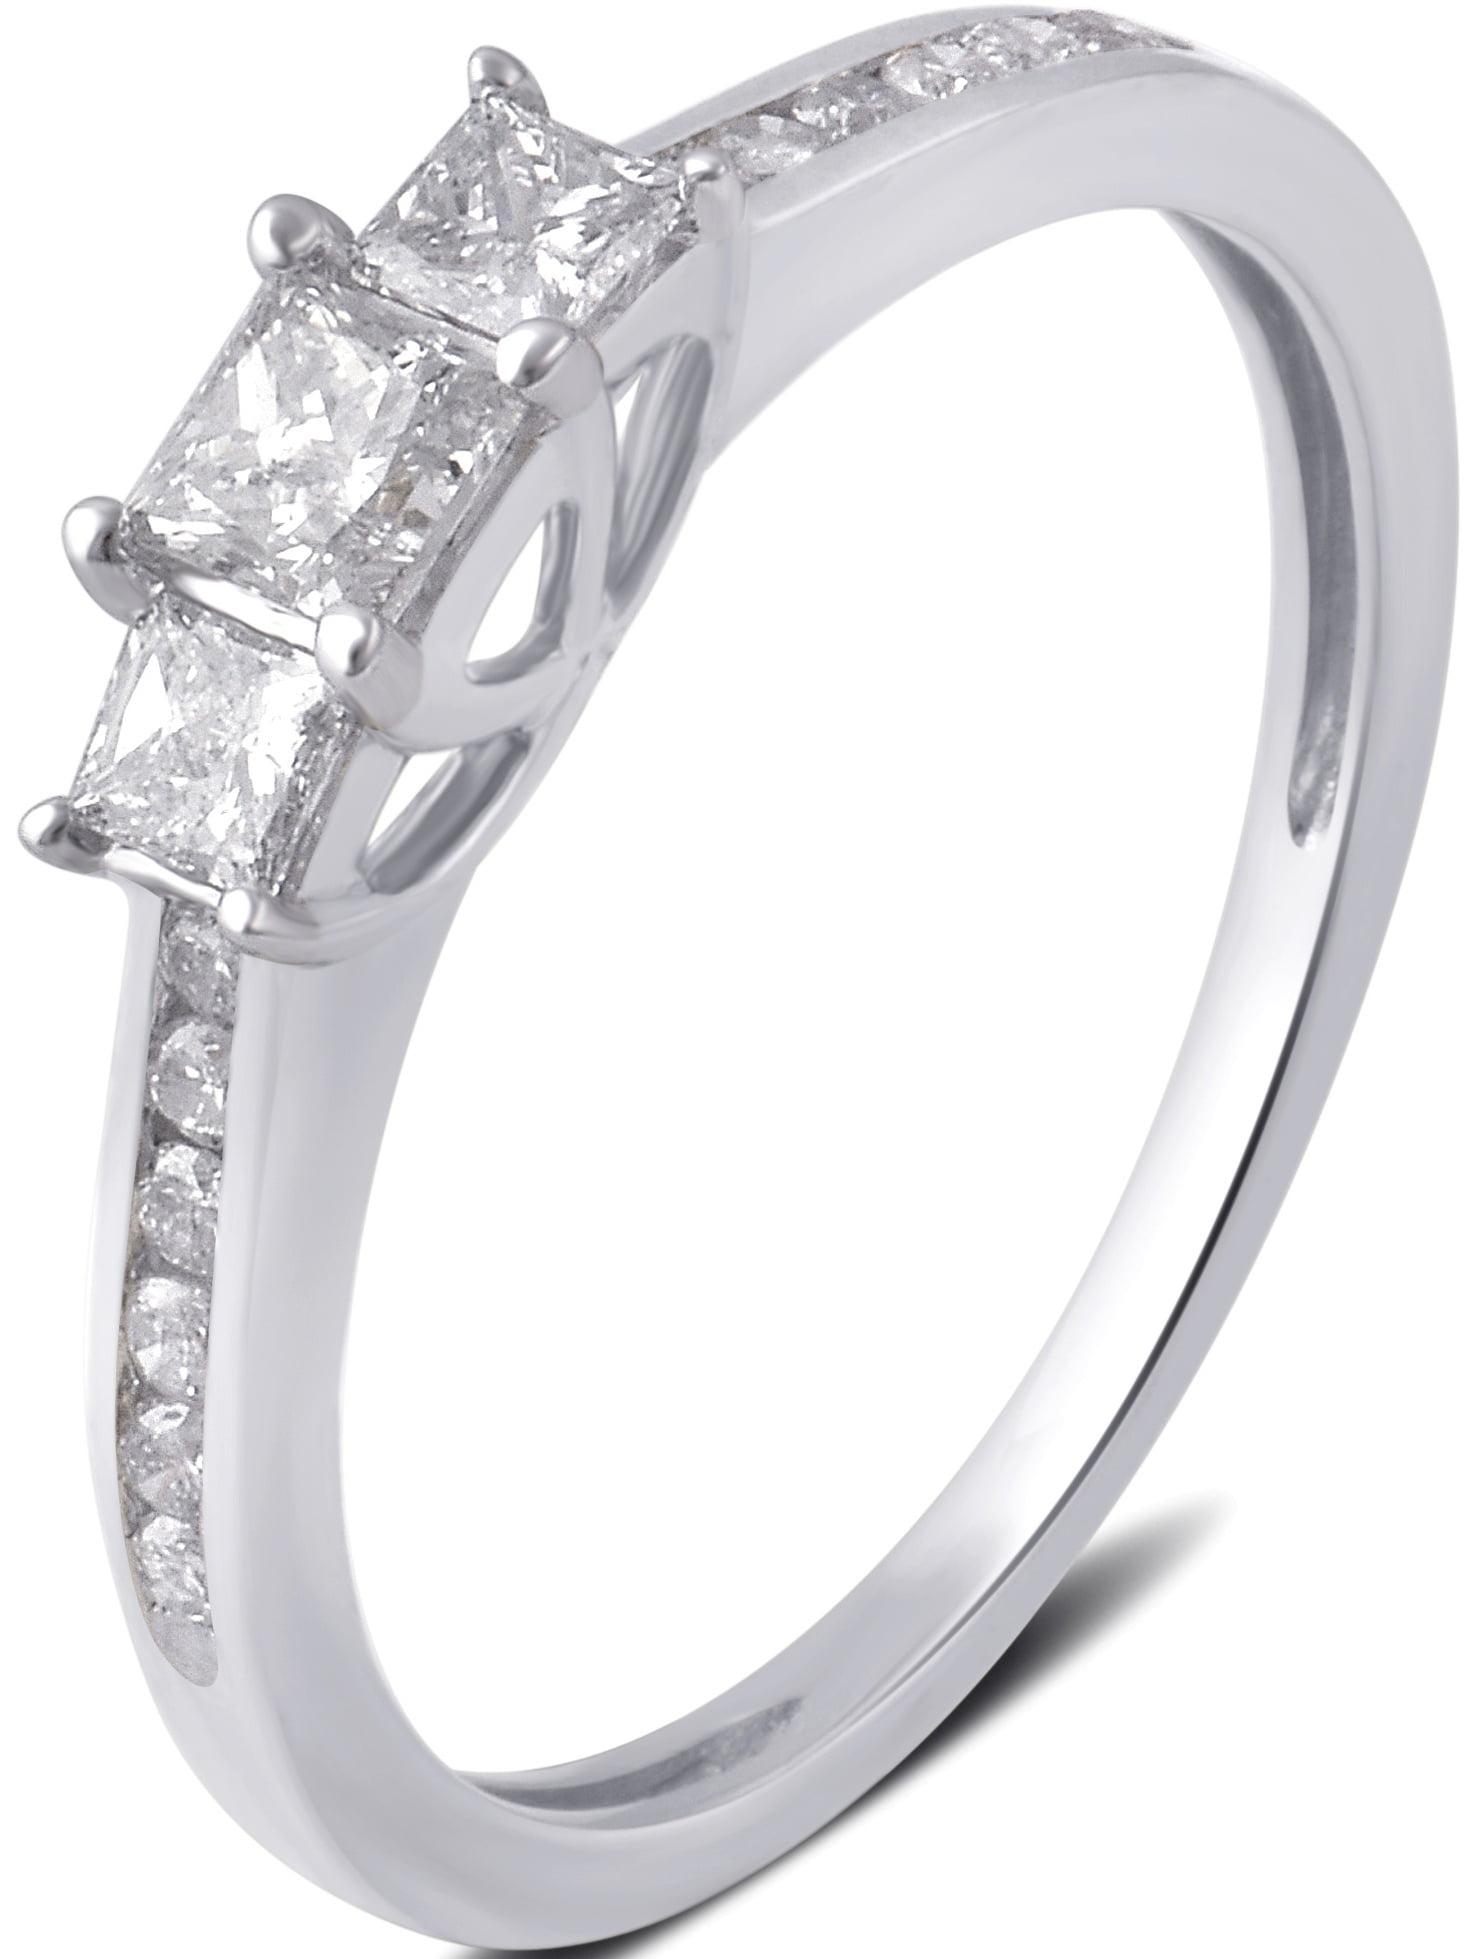 1/2 Carat T.W. 3 stone Princess Diamond 10K White Gold Engagement Ring